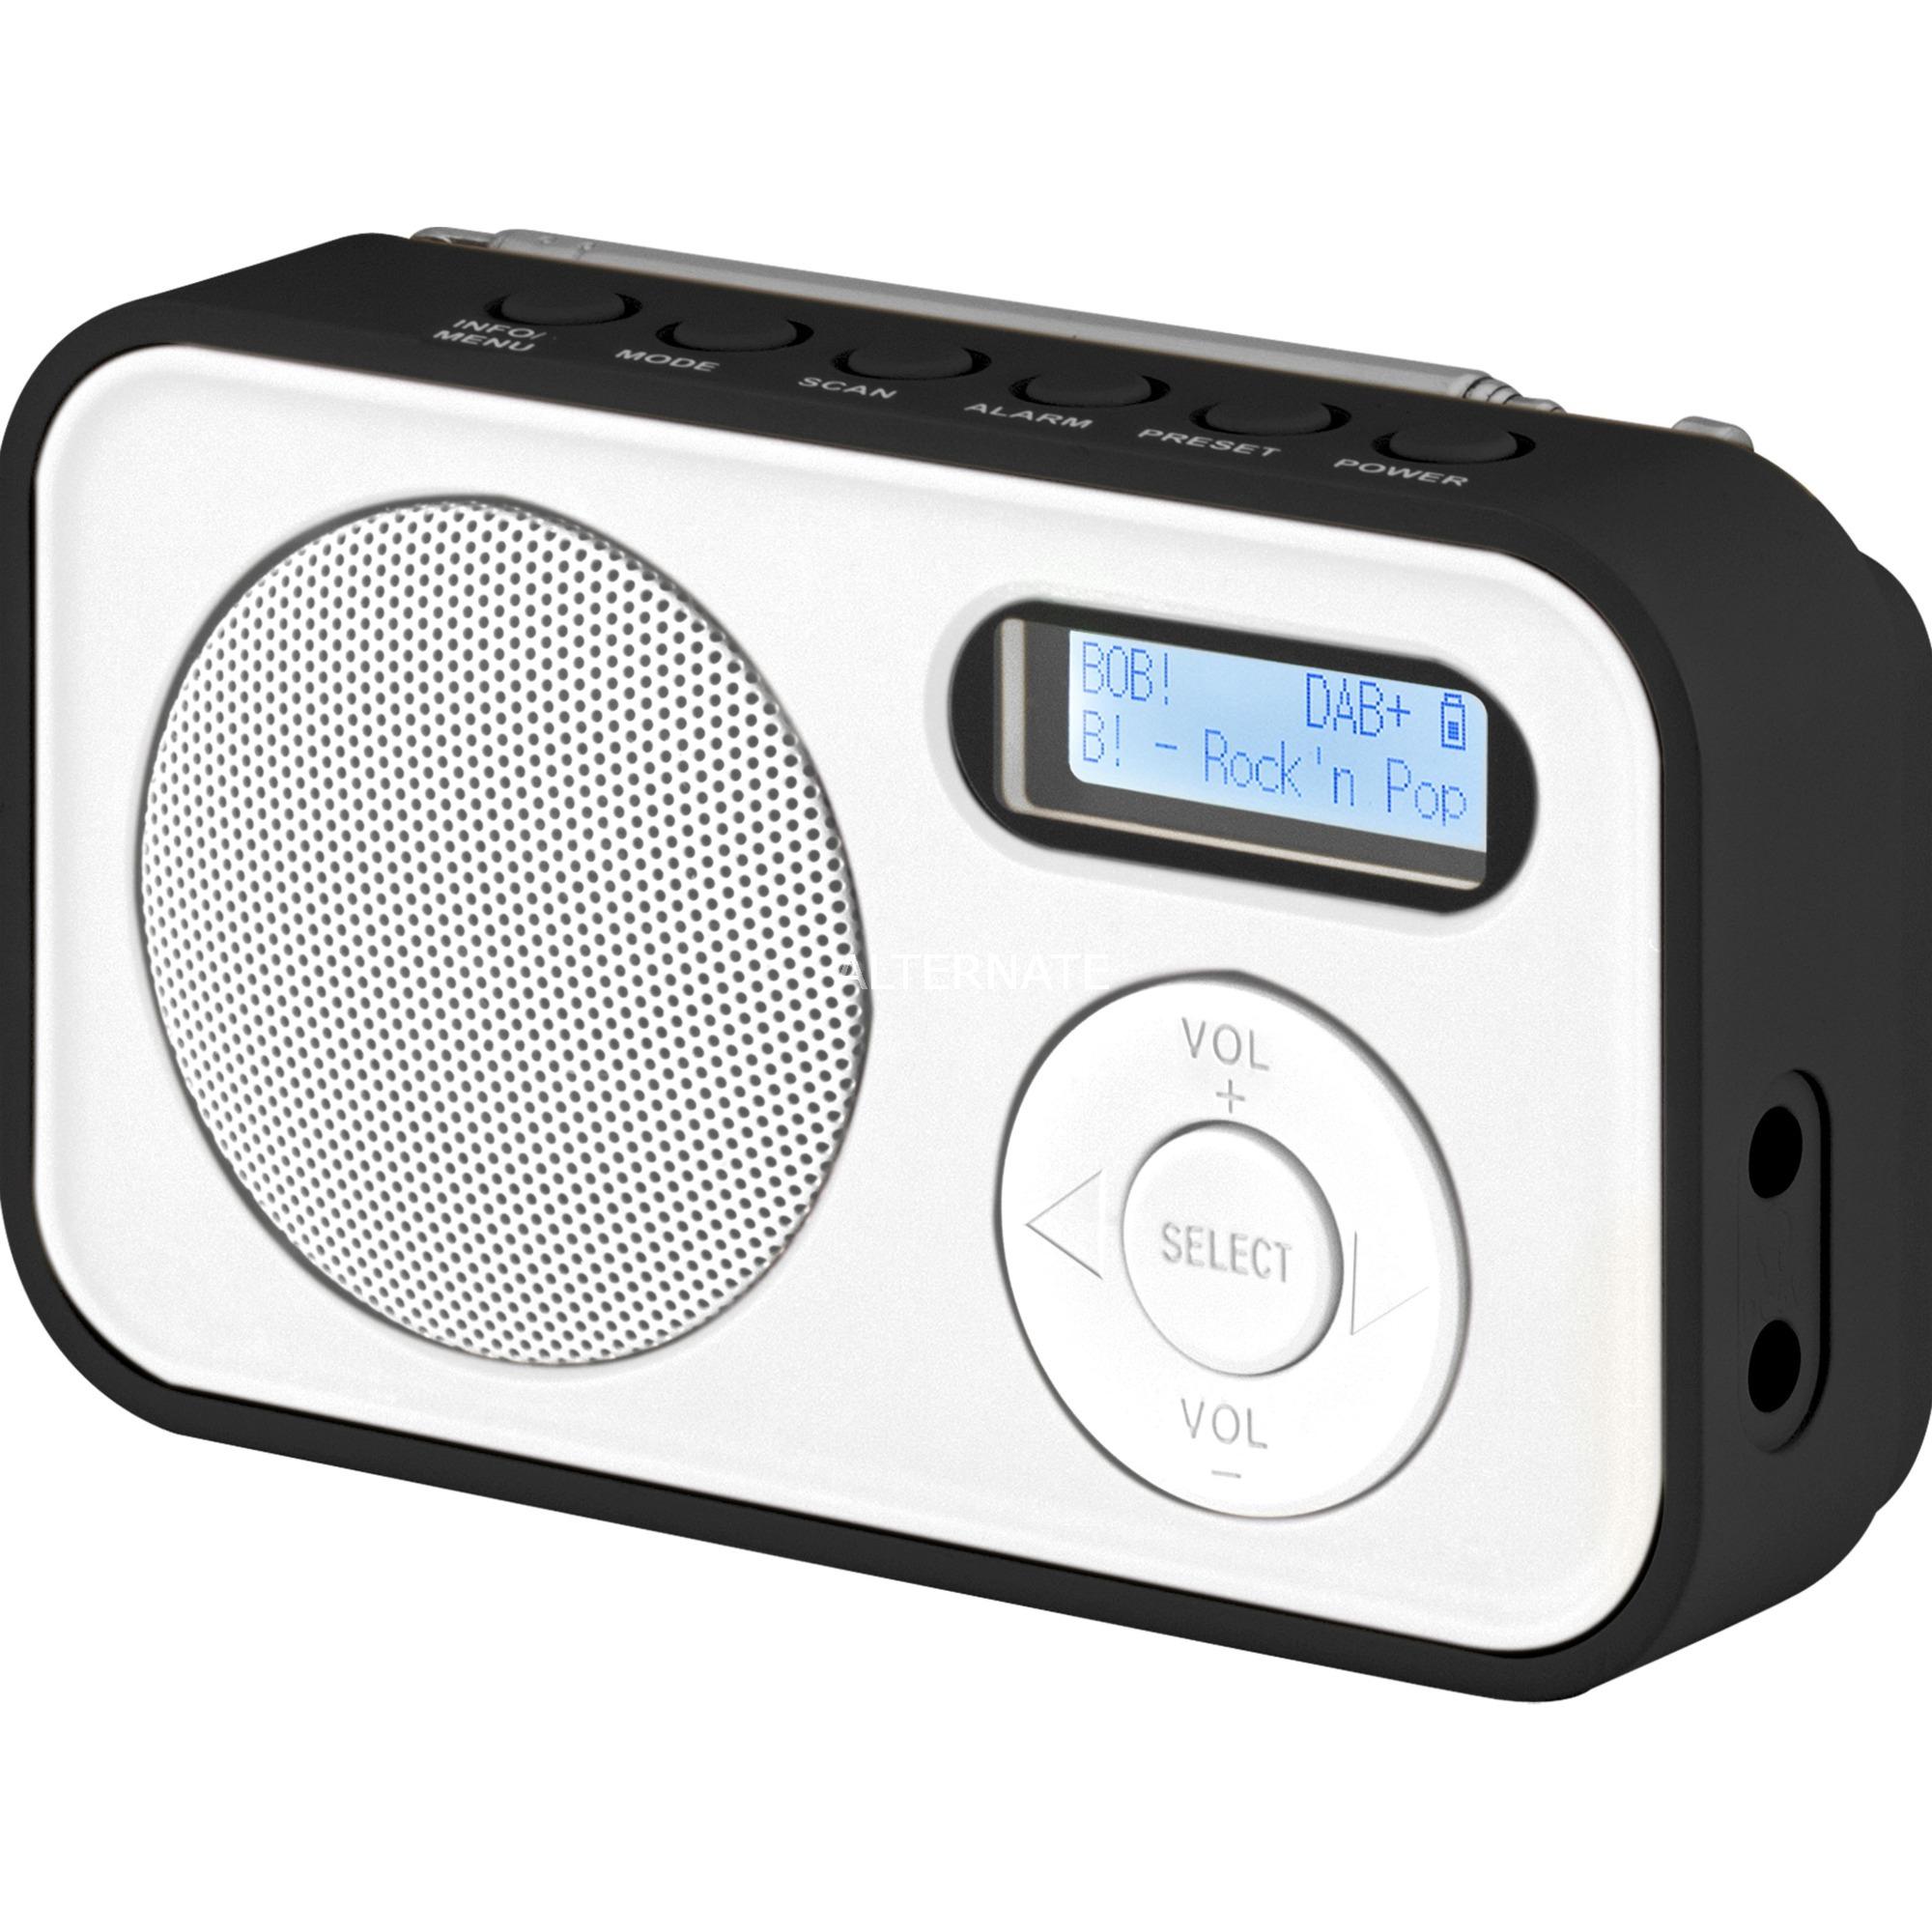 Dabman 12 radio Portátil Analógico y digital Negro, Blanco